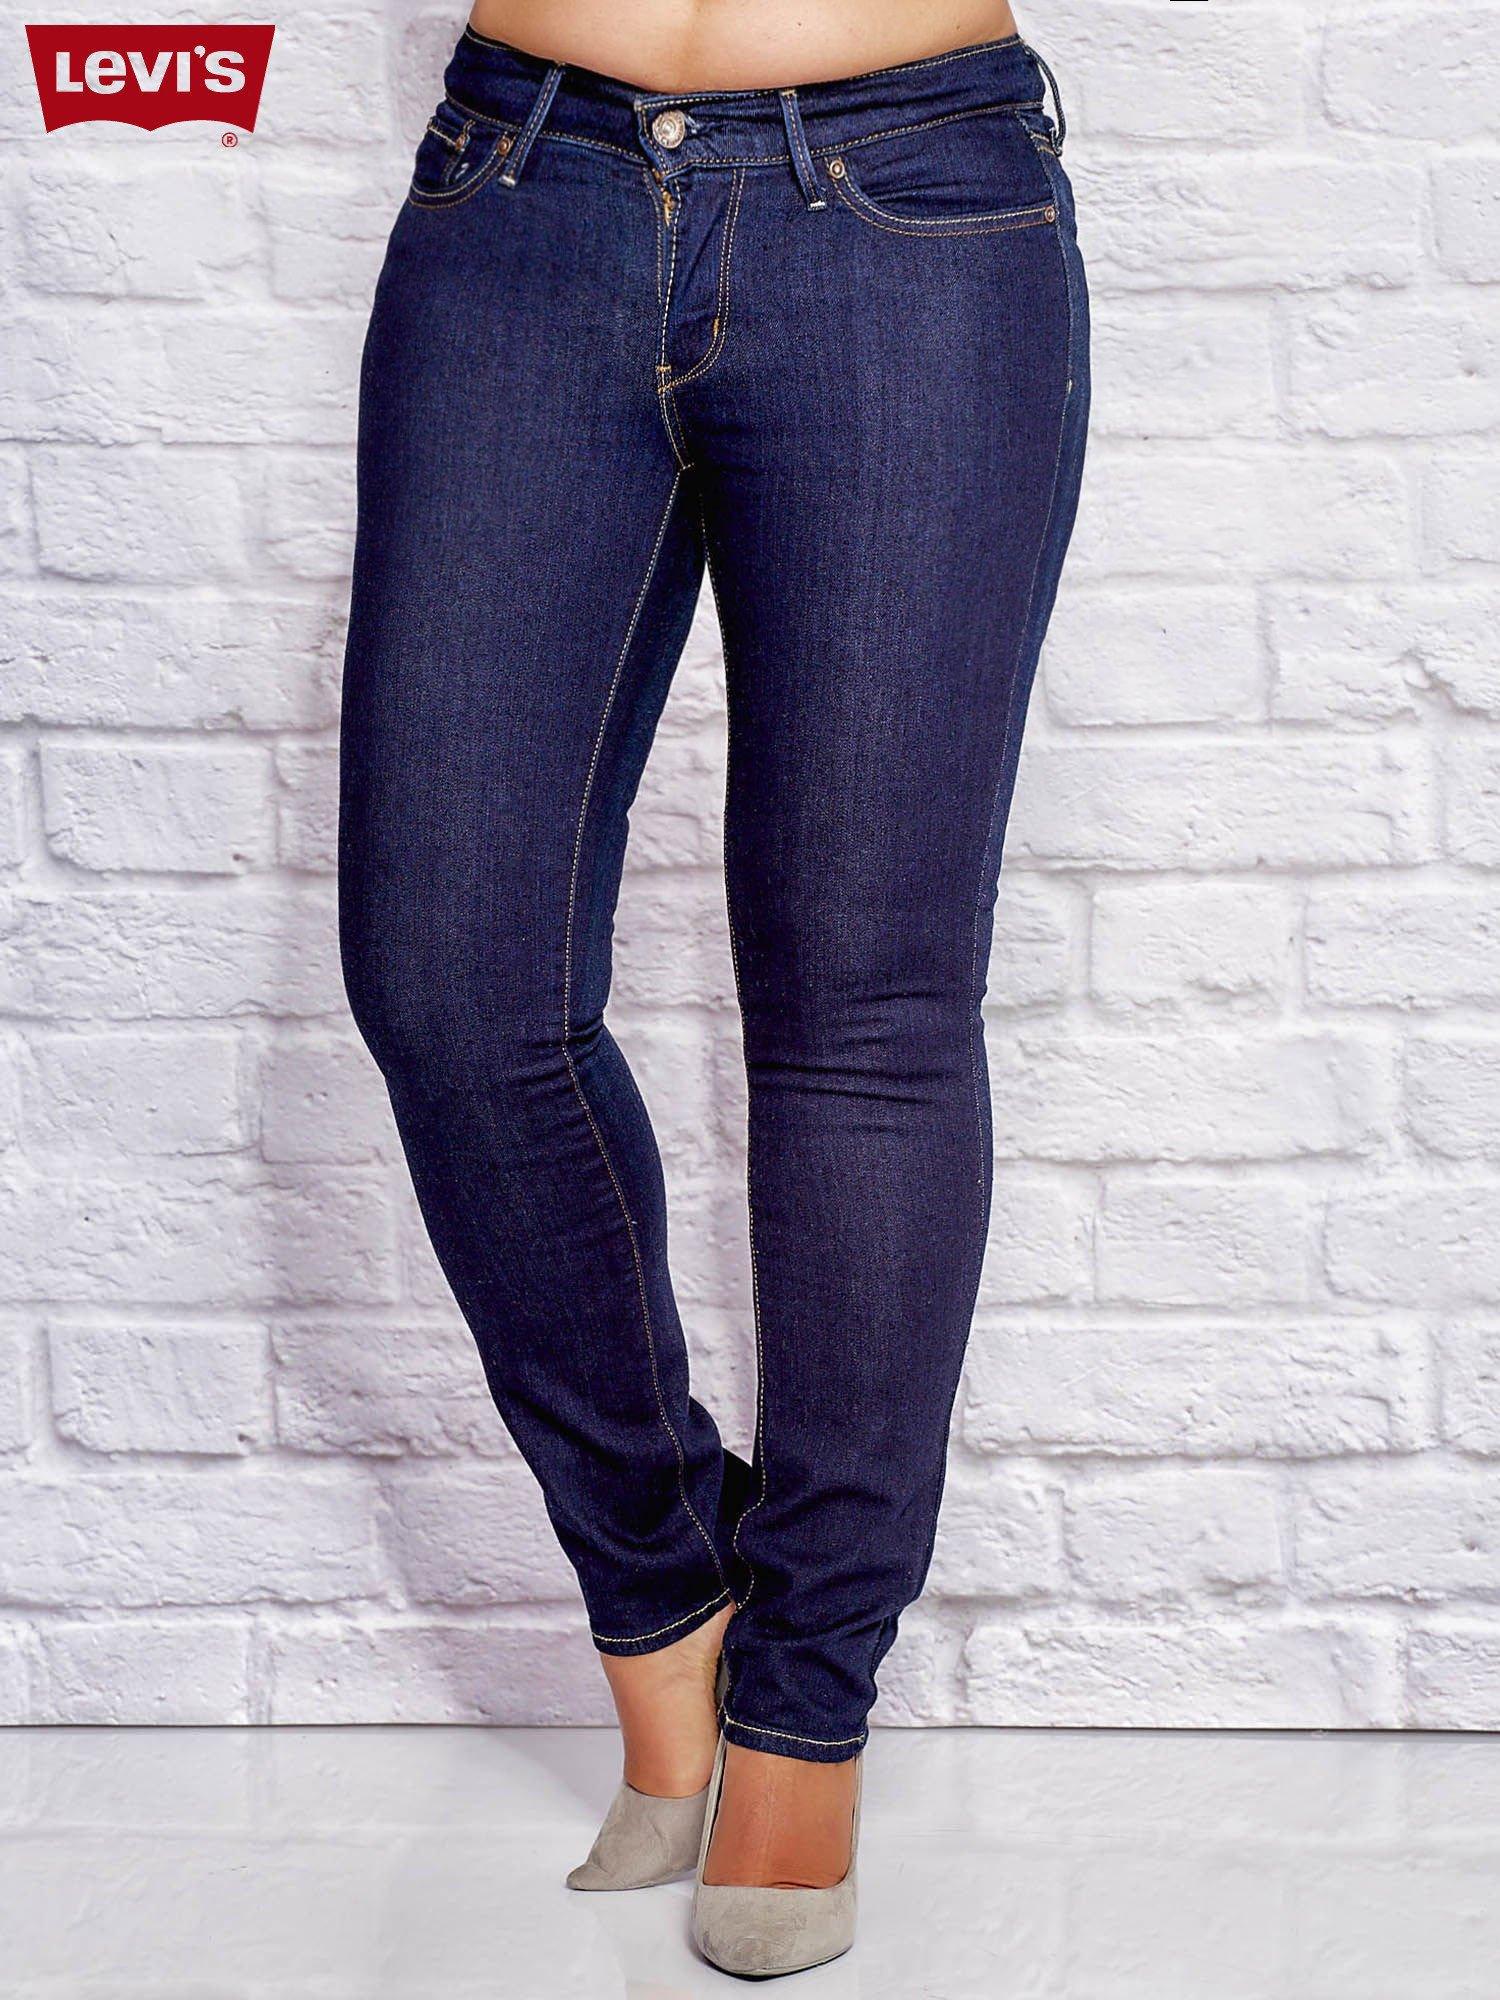 Randki Levis Jeans